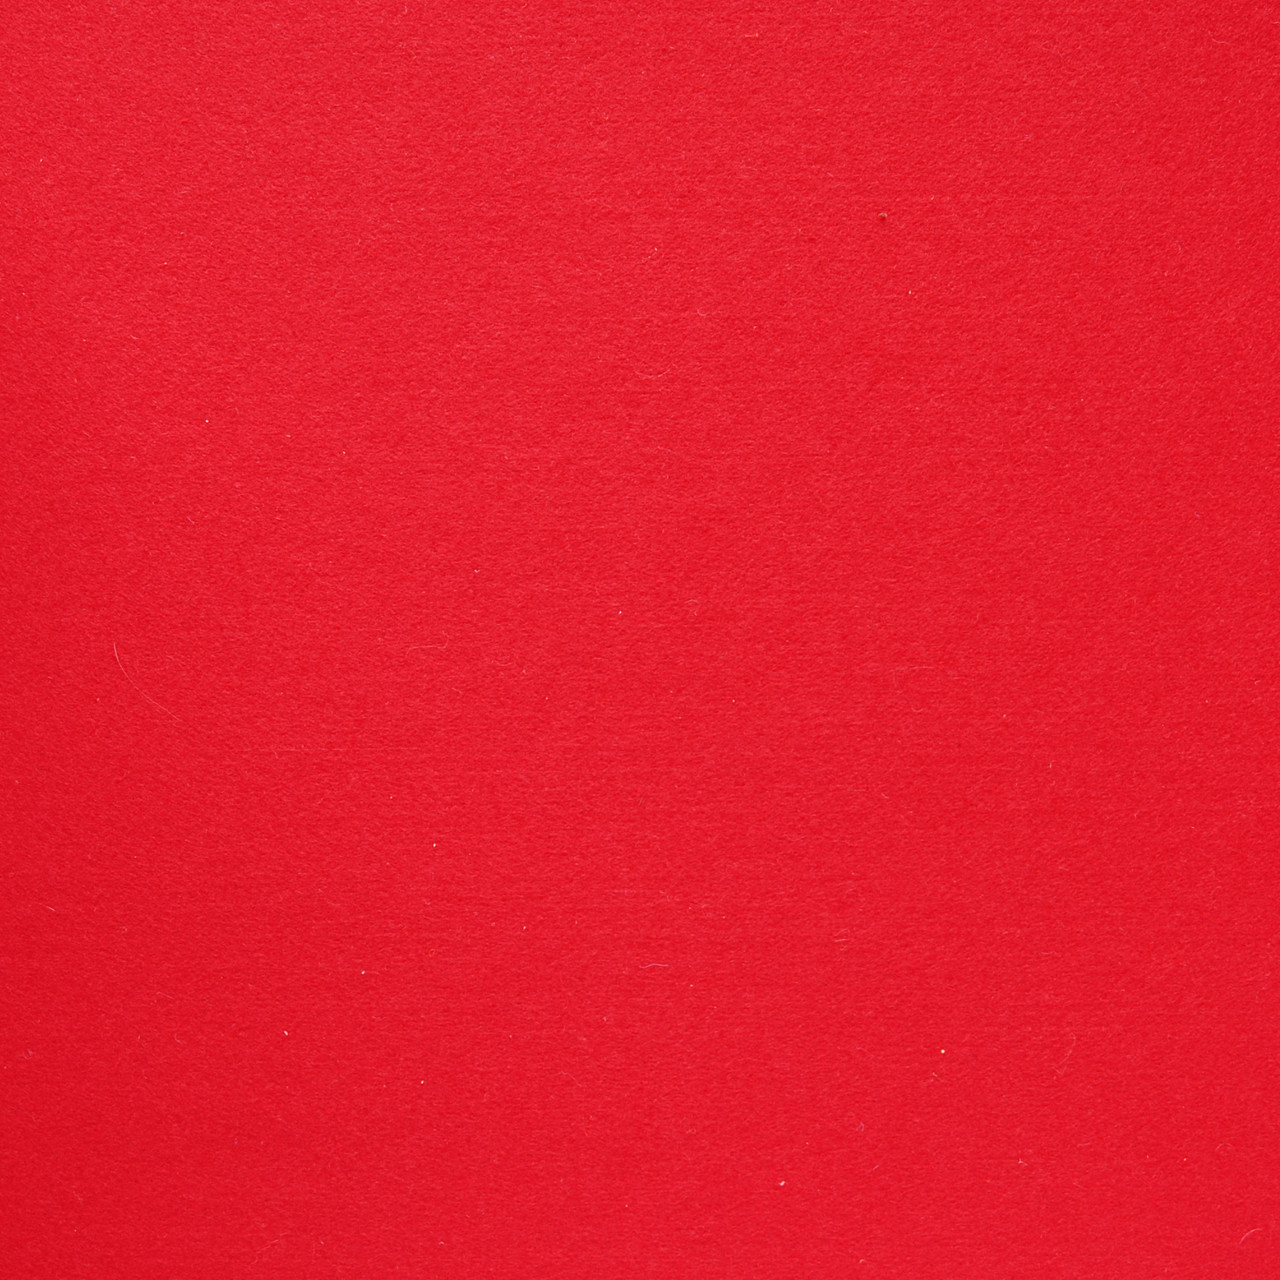 Фетр жесткий 4 мм, 45x33 см, КРАСНЫЙ, Китай